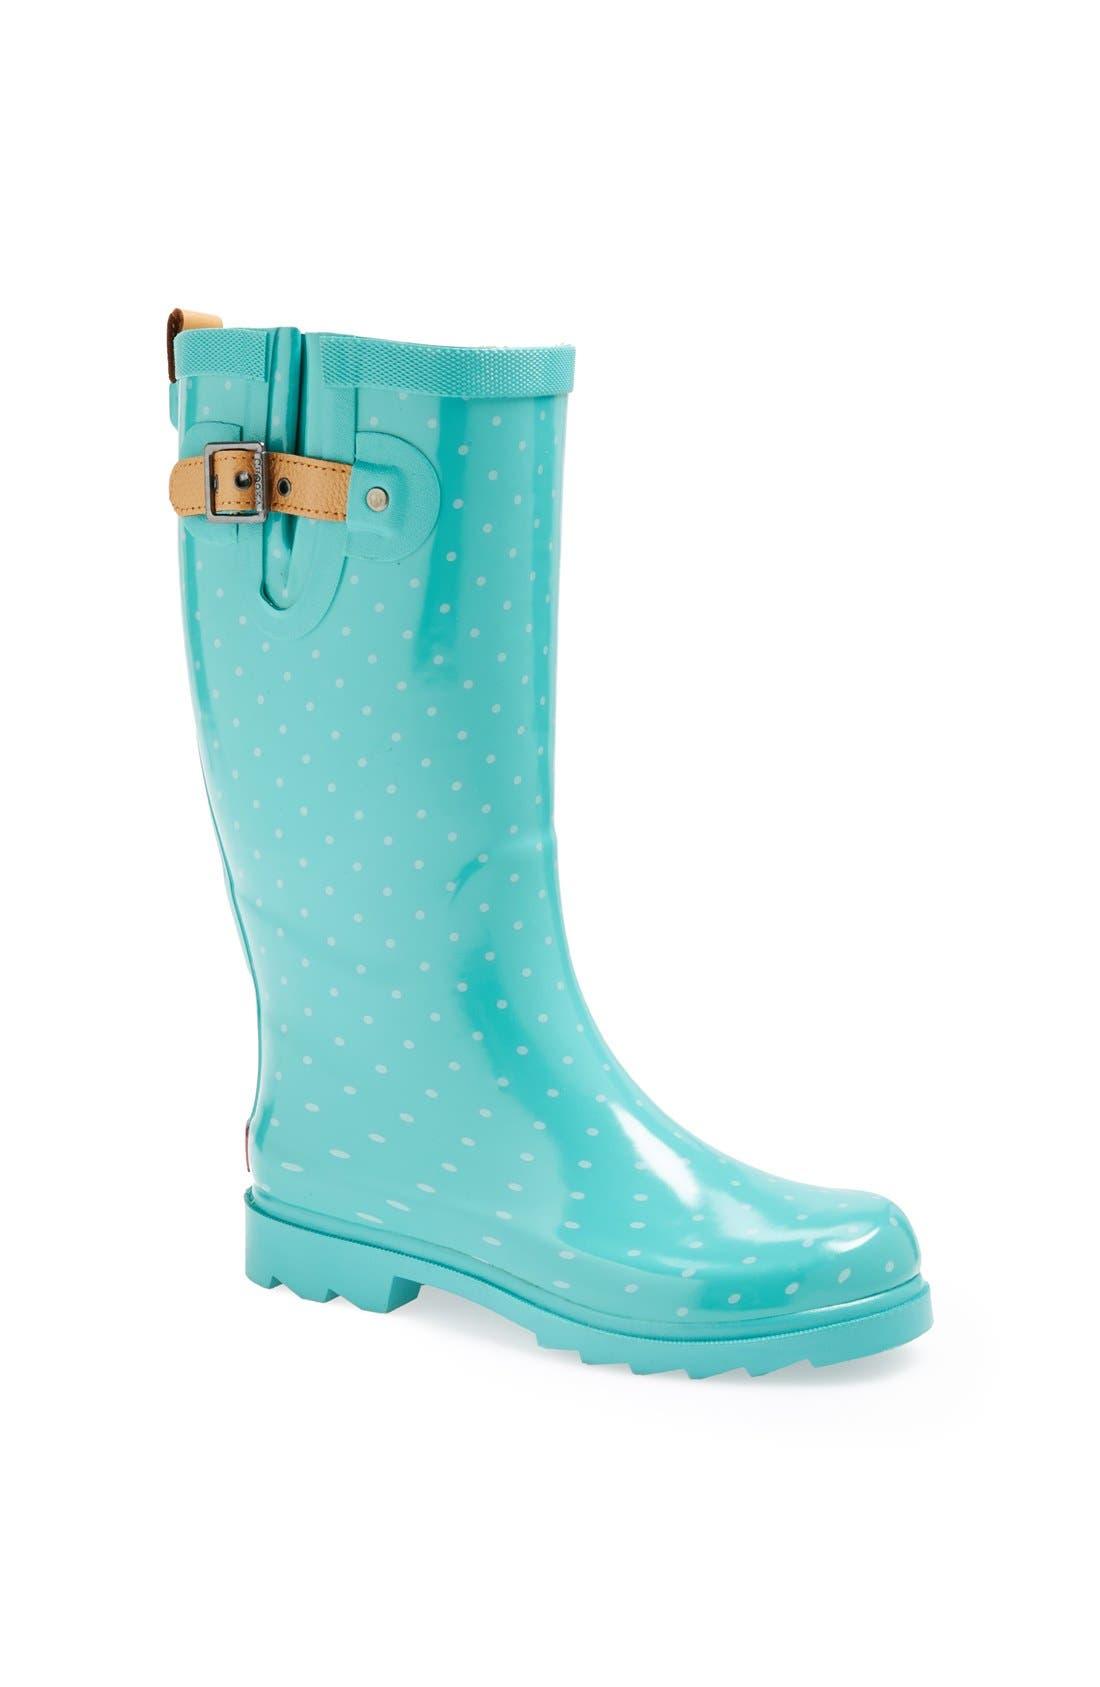 Alternate Image 1 Selected - Chooka 'Posh Dot' Rain Boot